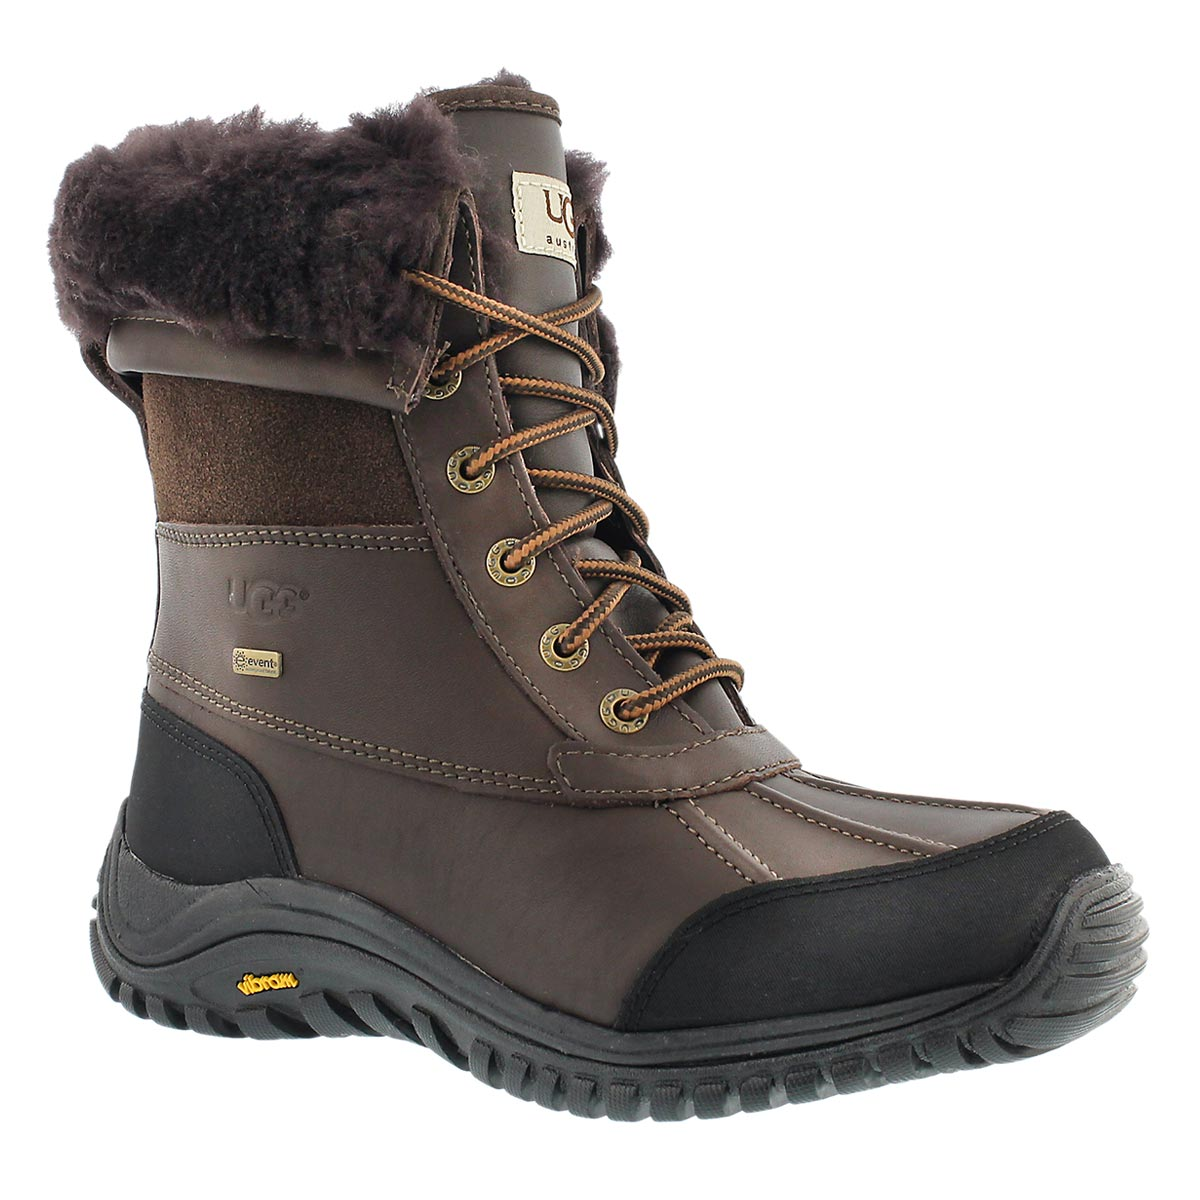 Women's ADIRONDACK II obsidian winter boots